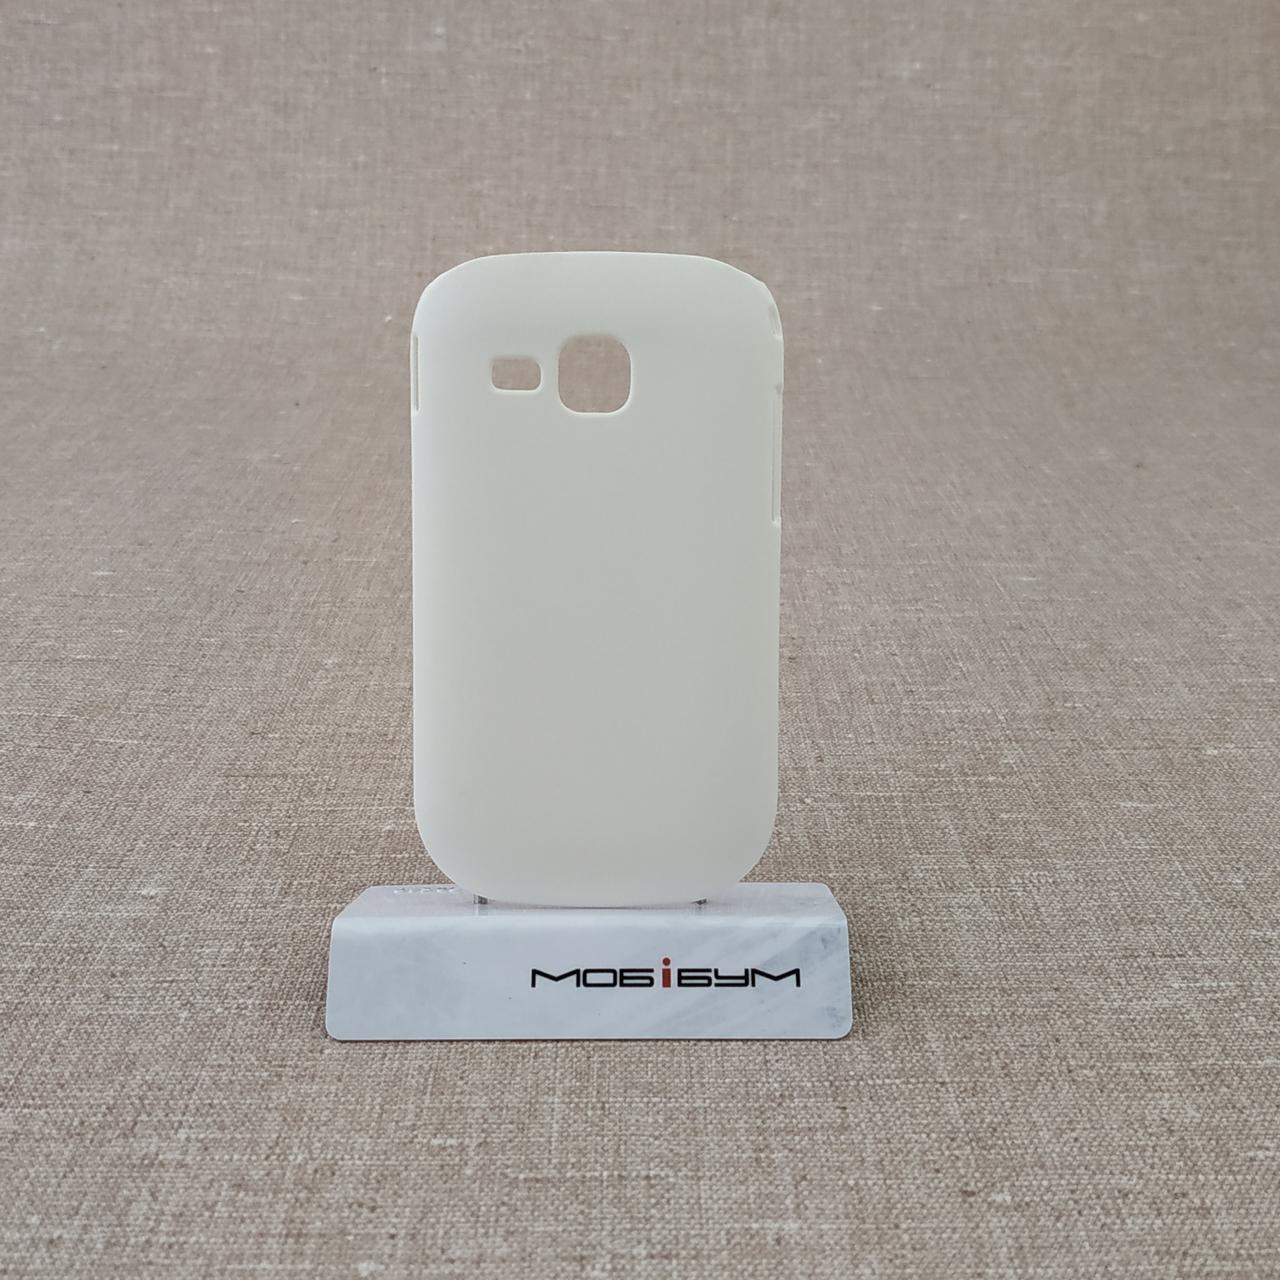 Чехол Essence Harrison Samsung S5292 white [BCSSS5292P4WH] EAN/UPC: 6958971502693